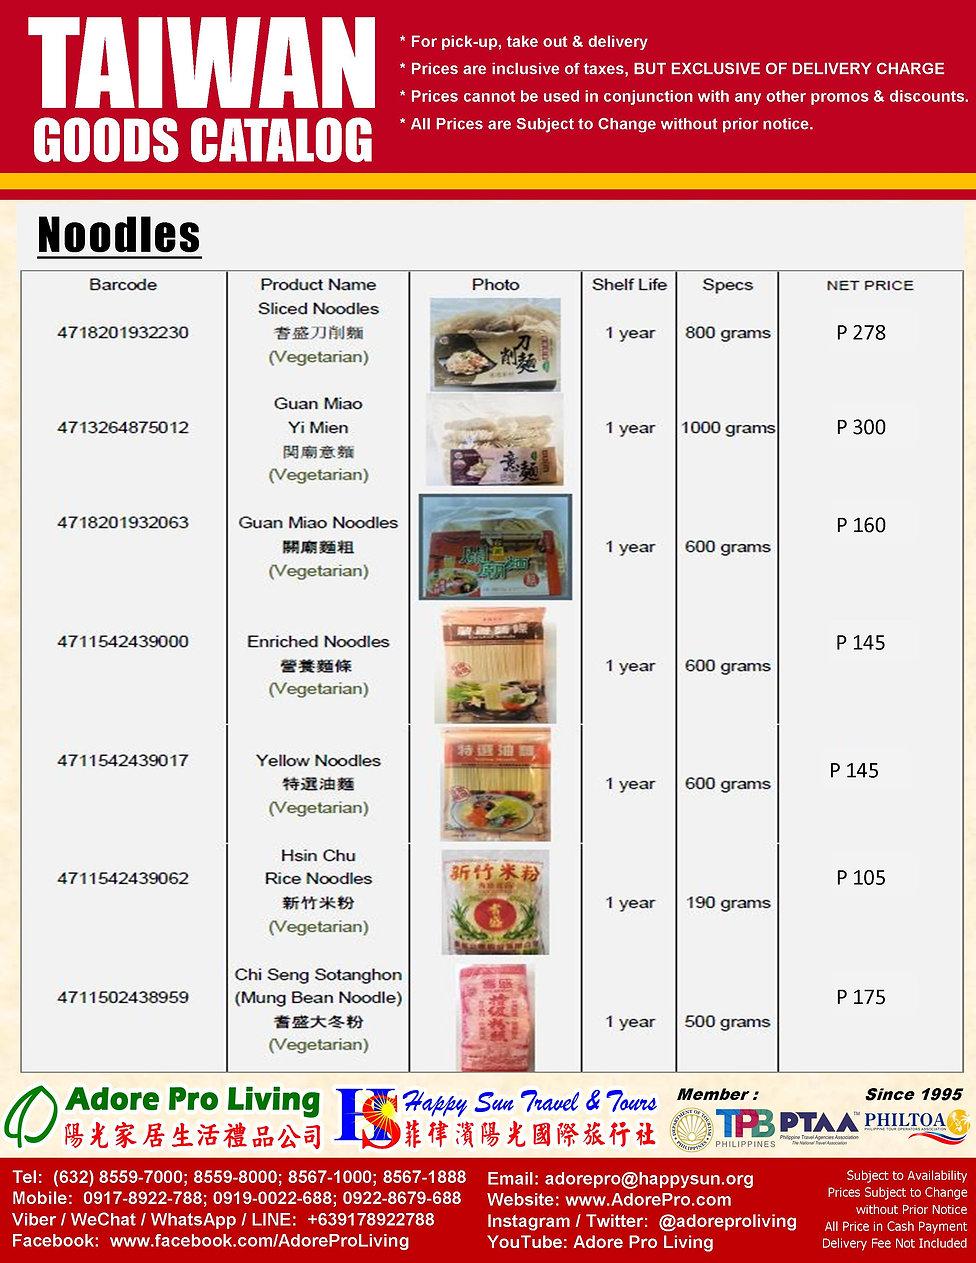 P14_Taiwan Goods Catalog_202009119.jpg